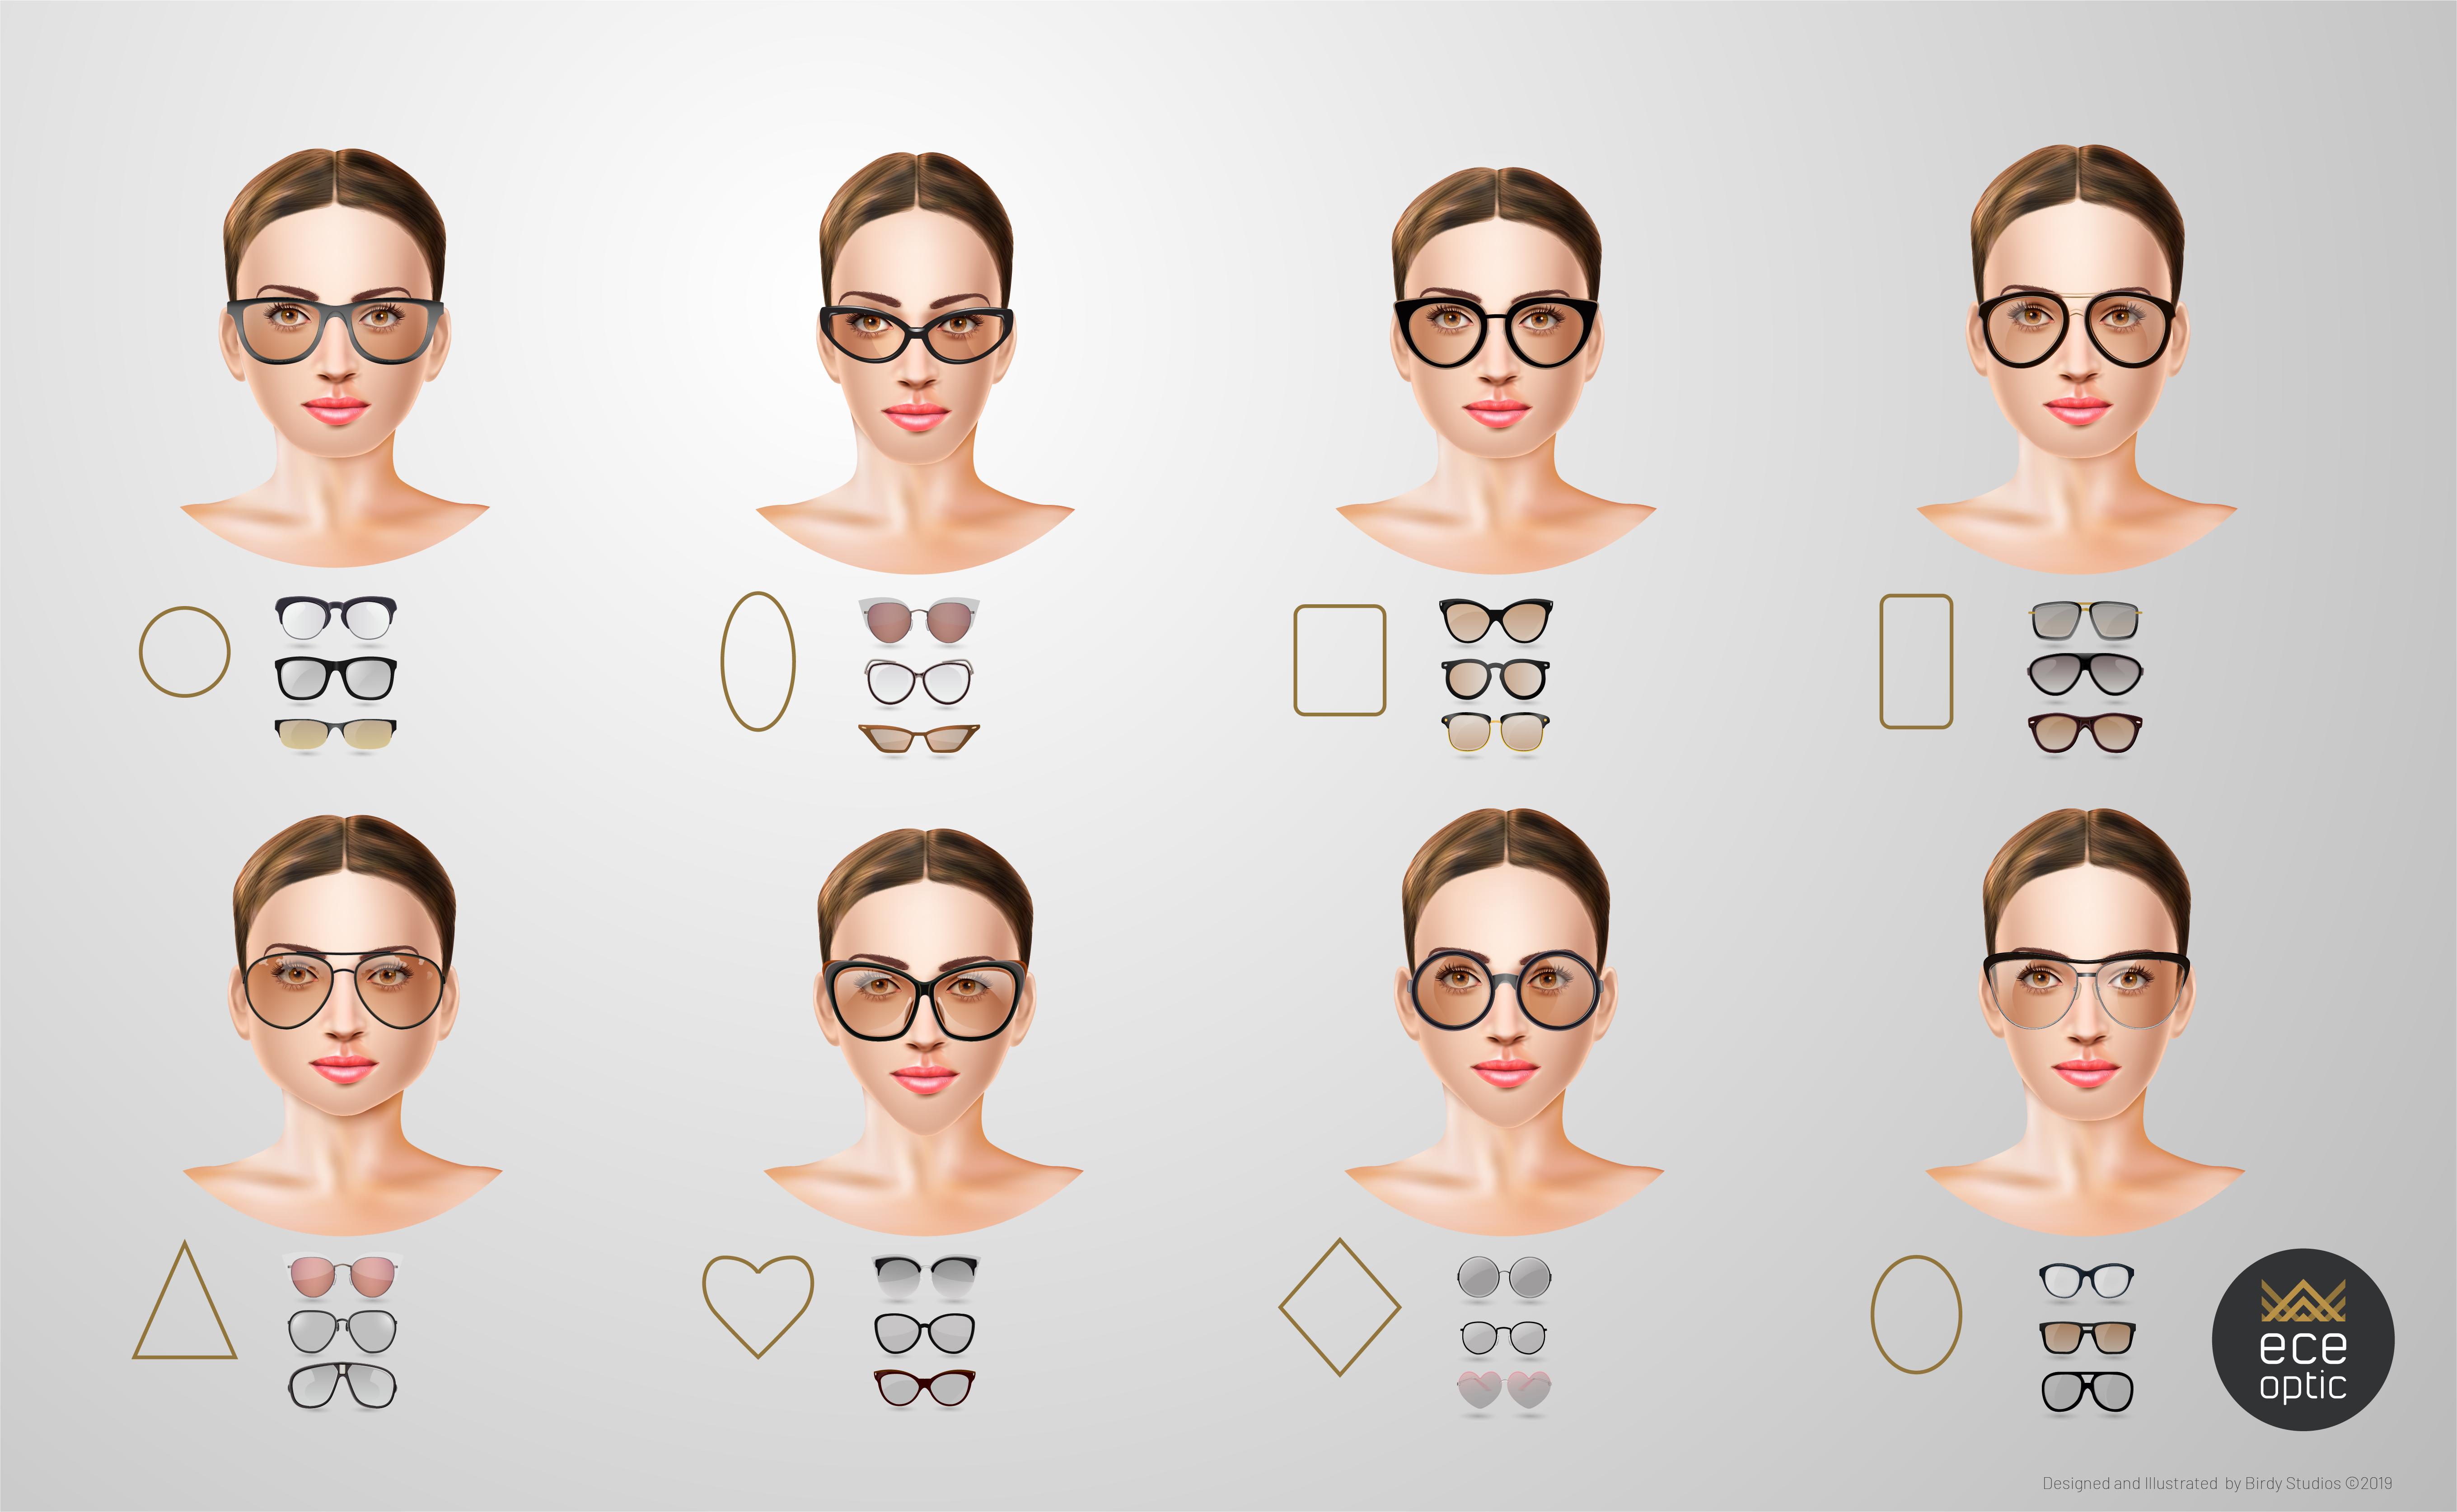 Ece Optic Illustration